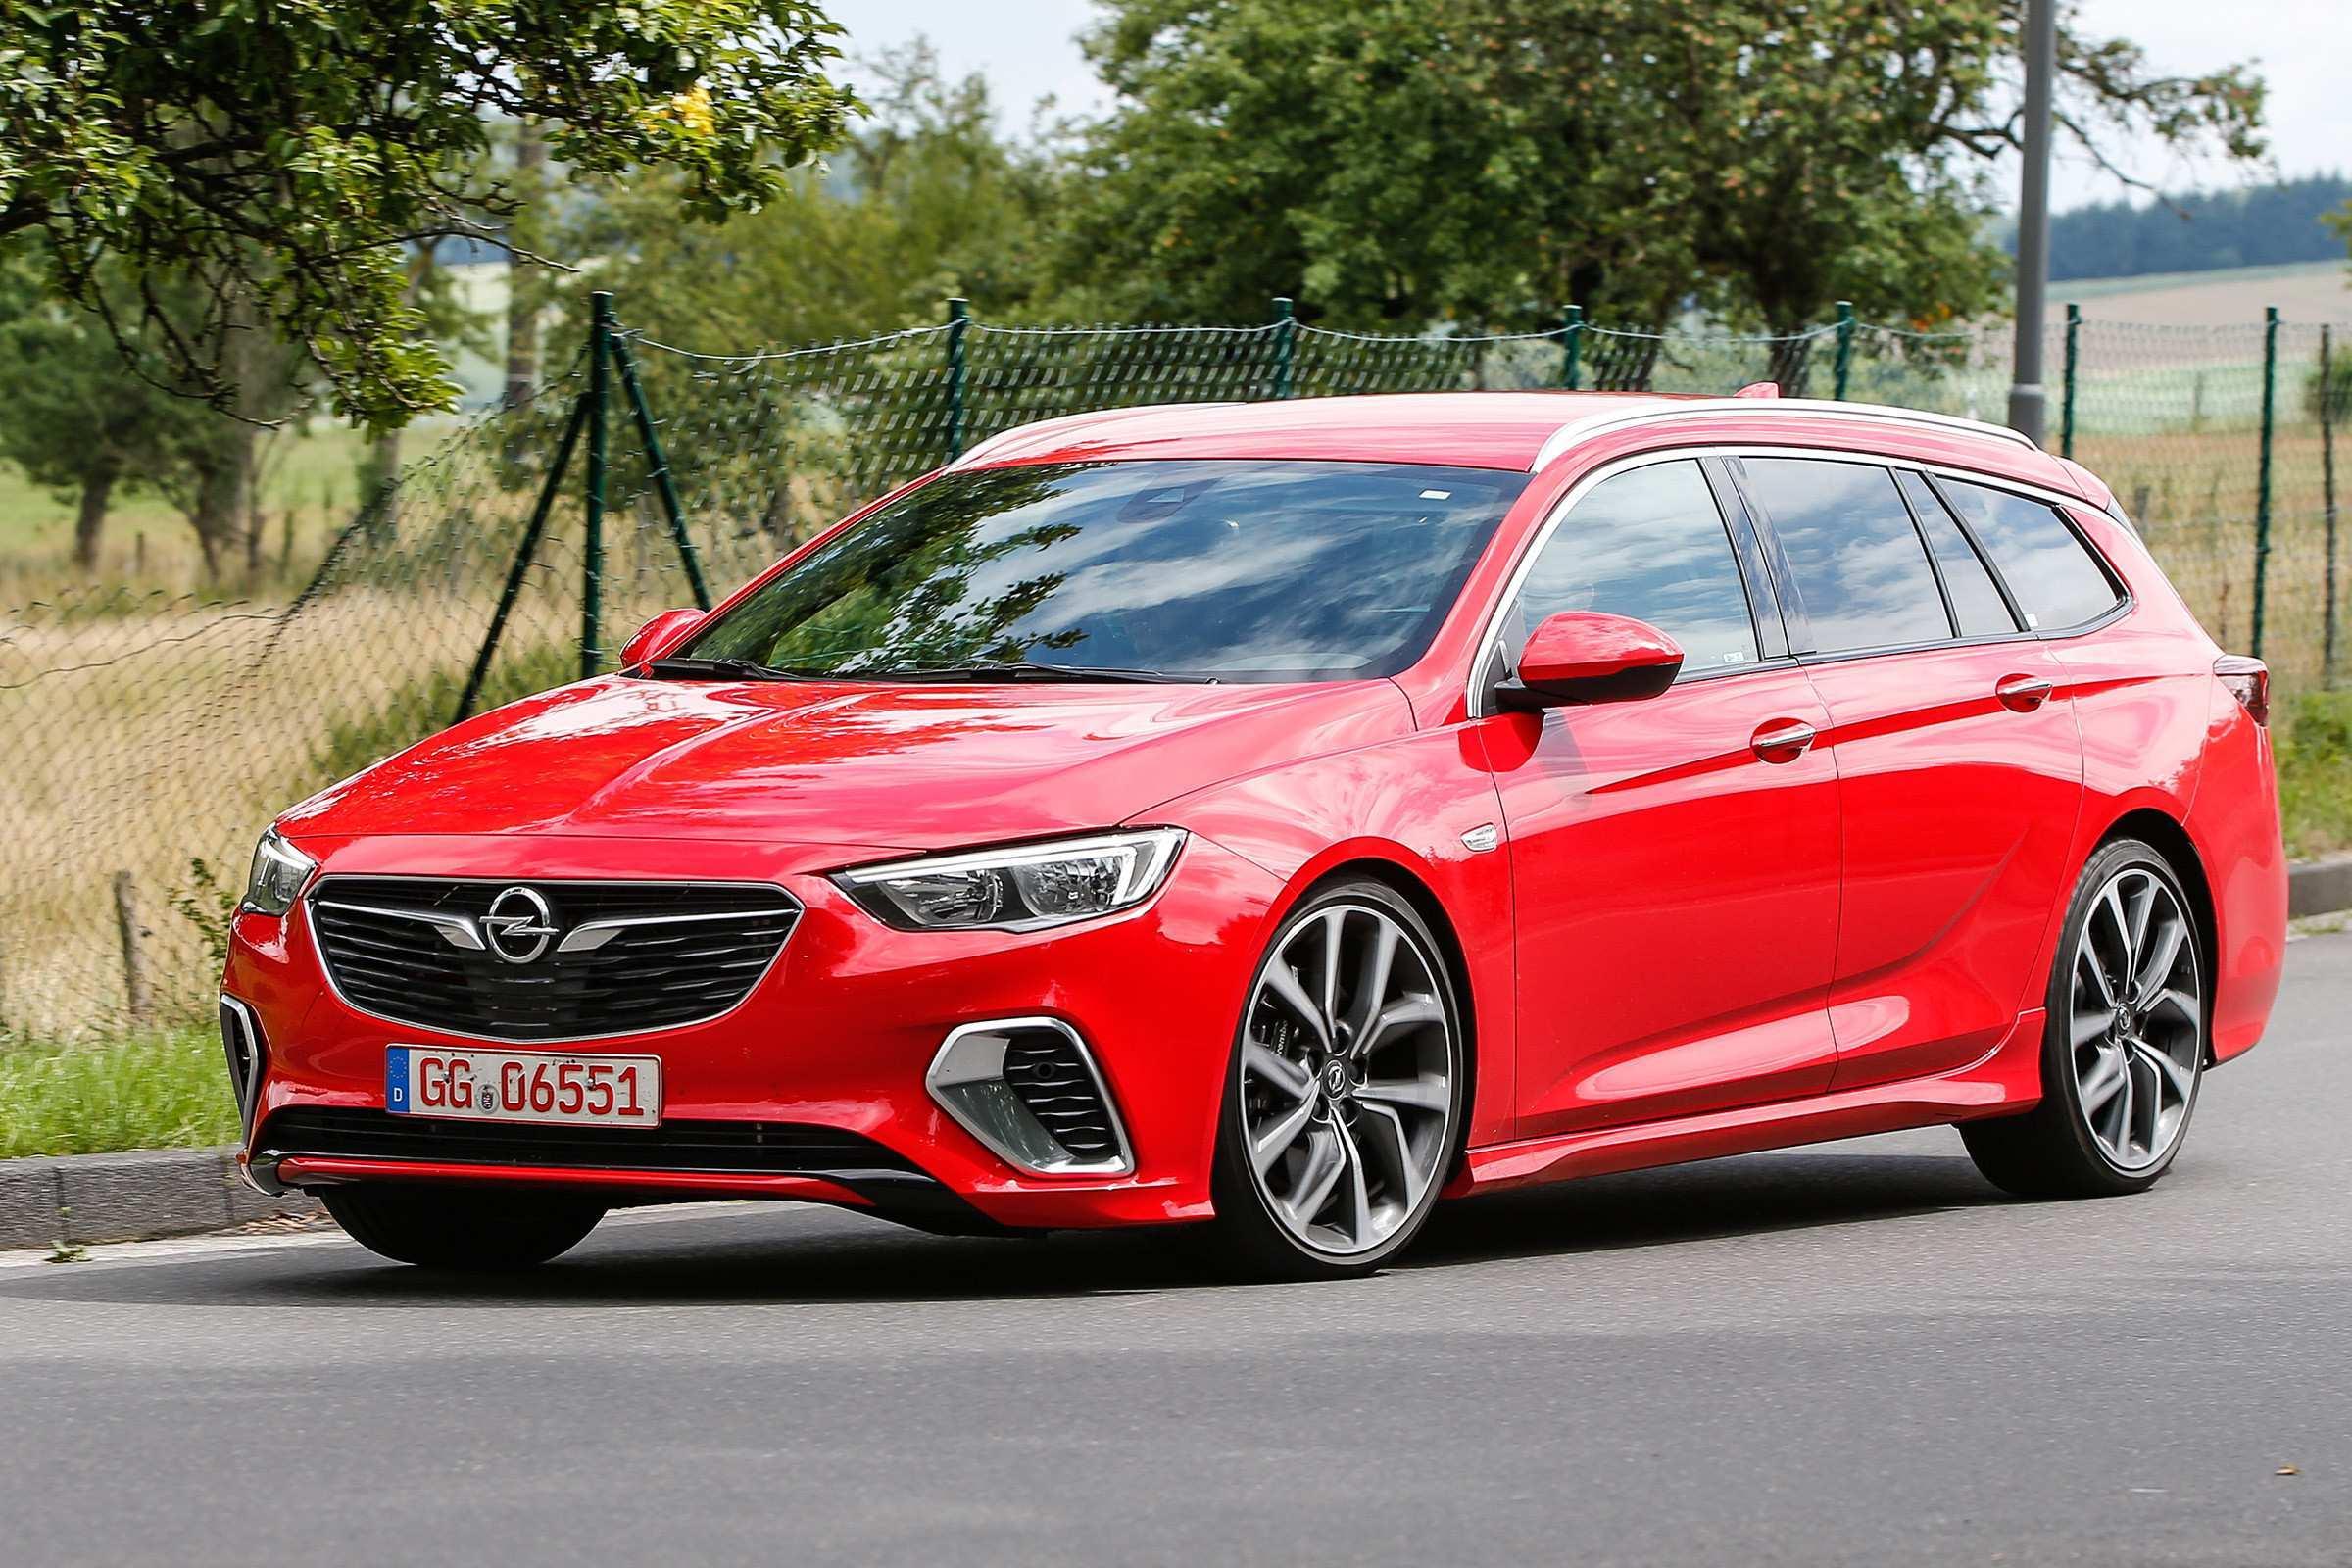 35 Concept of Opel Insignia Grand Sport 2020 Release by Opel Insignia Grand Sport 2020